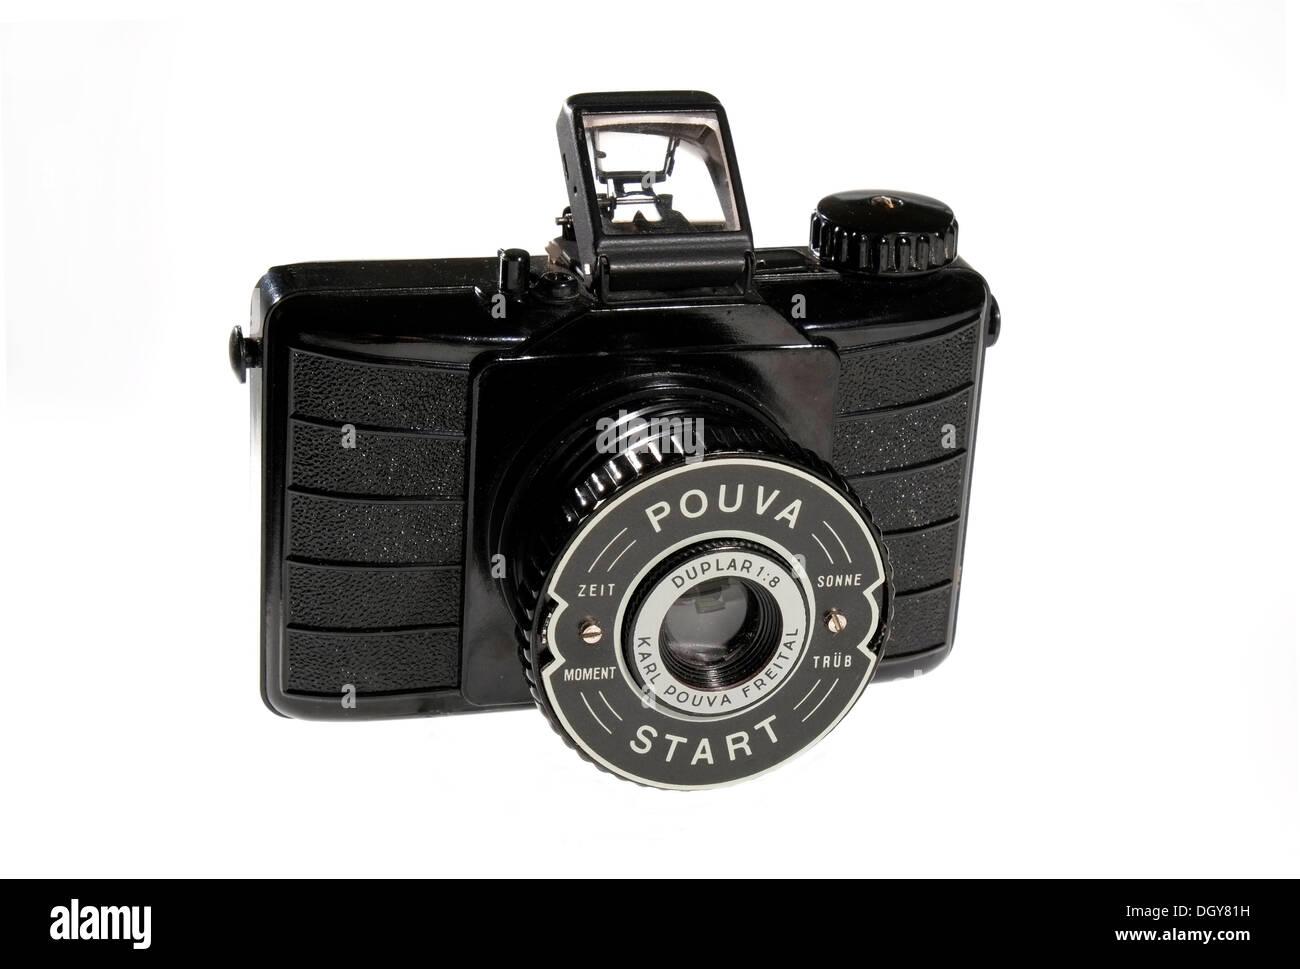 DDR cult camera, Pouva Start, roll film camera 6x6 - Stock Image